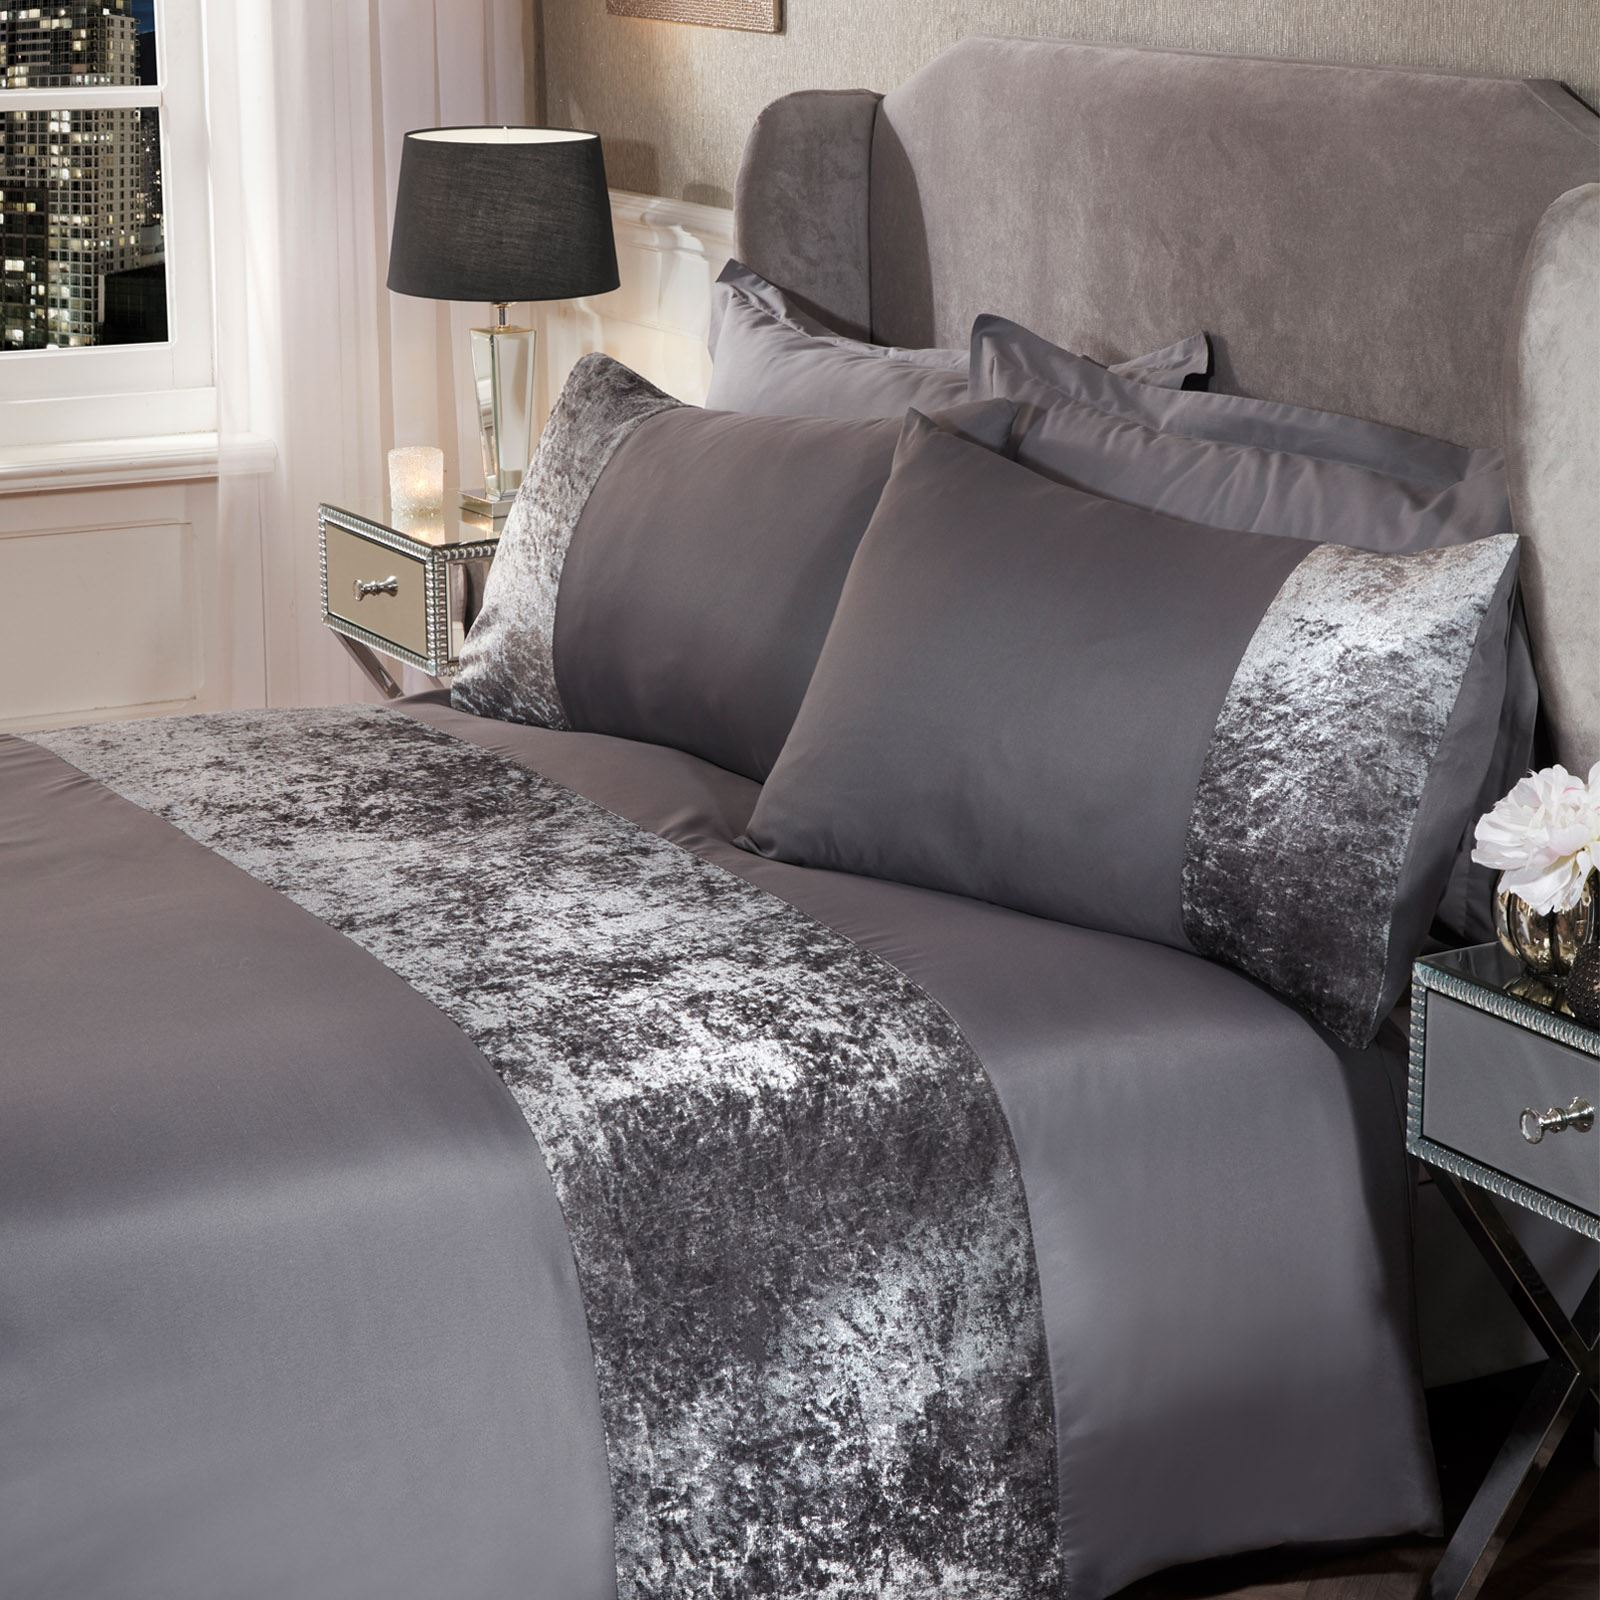 thumbnail 29 - Sienna Crushed Velvet Panel Duvet Cover with Pillow Case Bedding Set Silver Grey